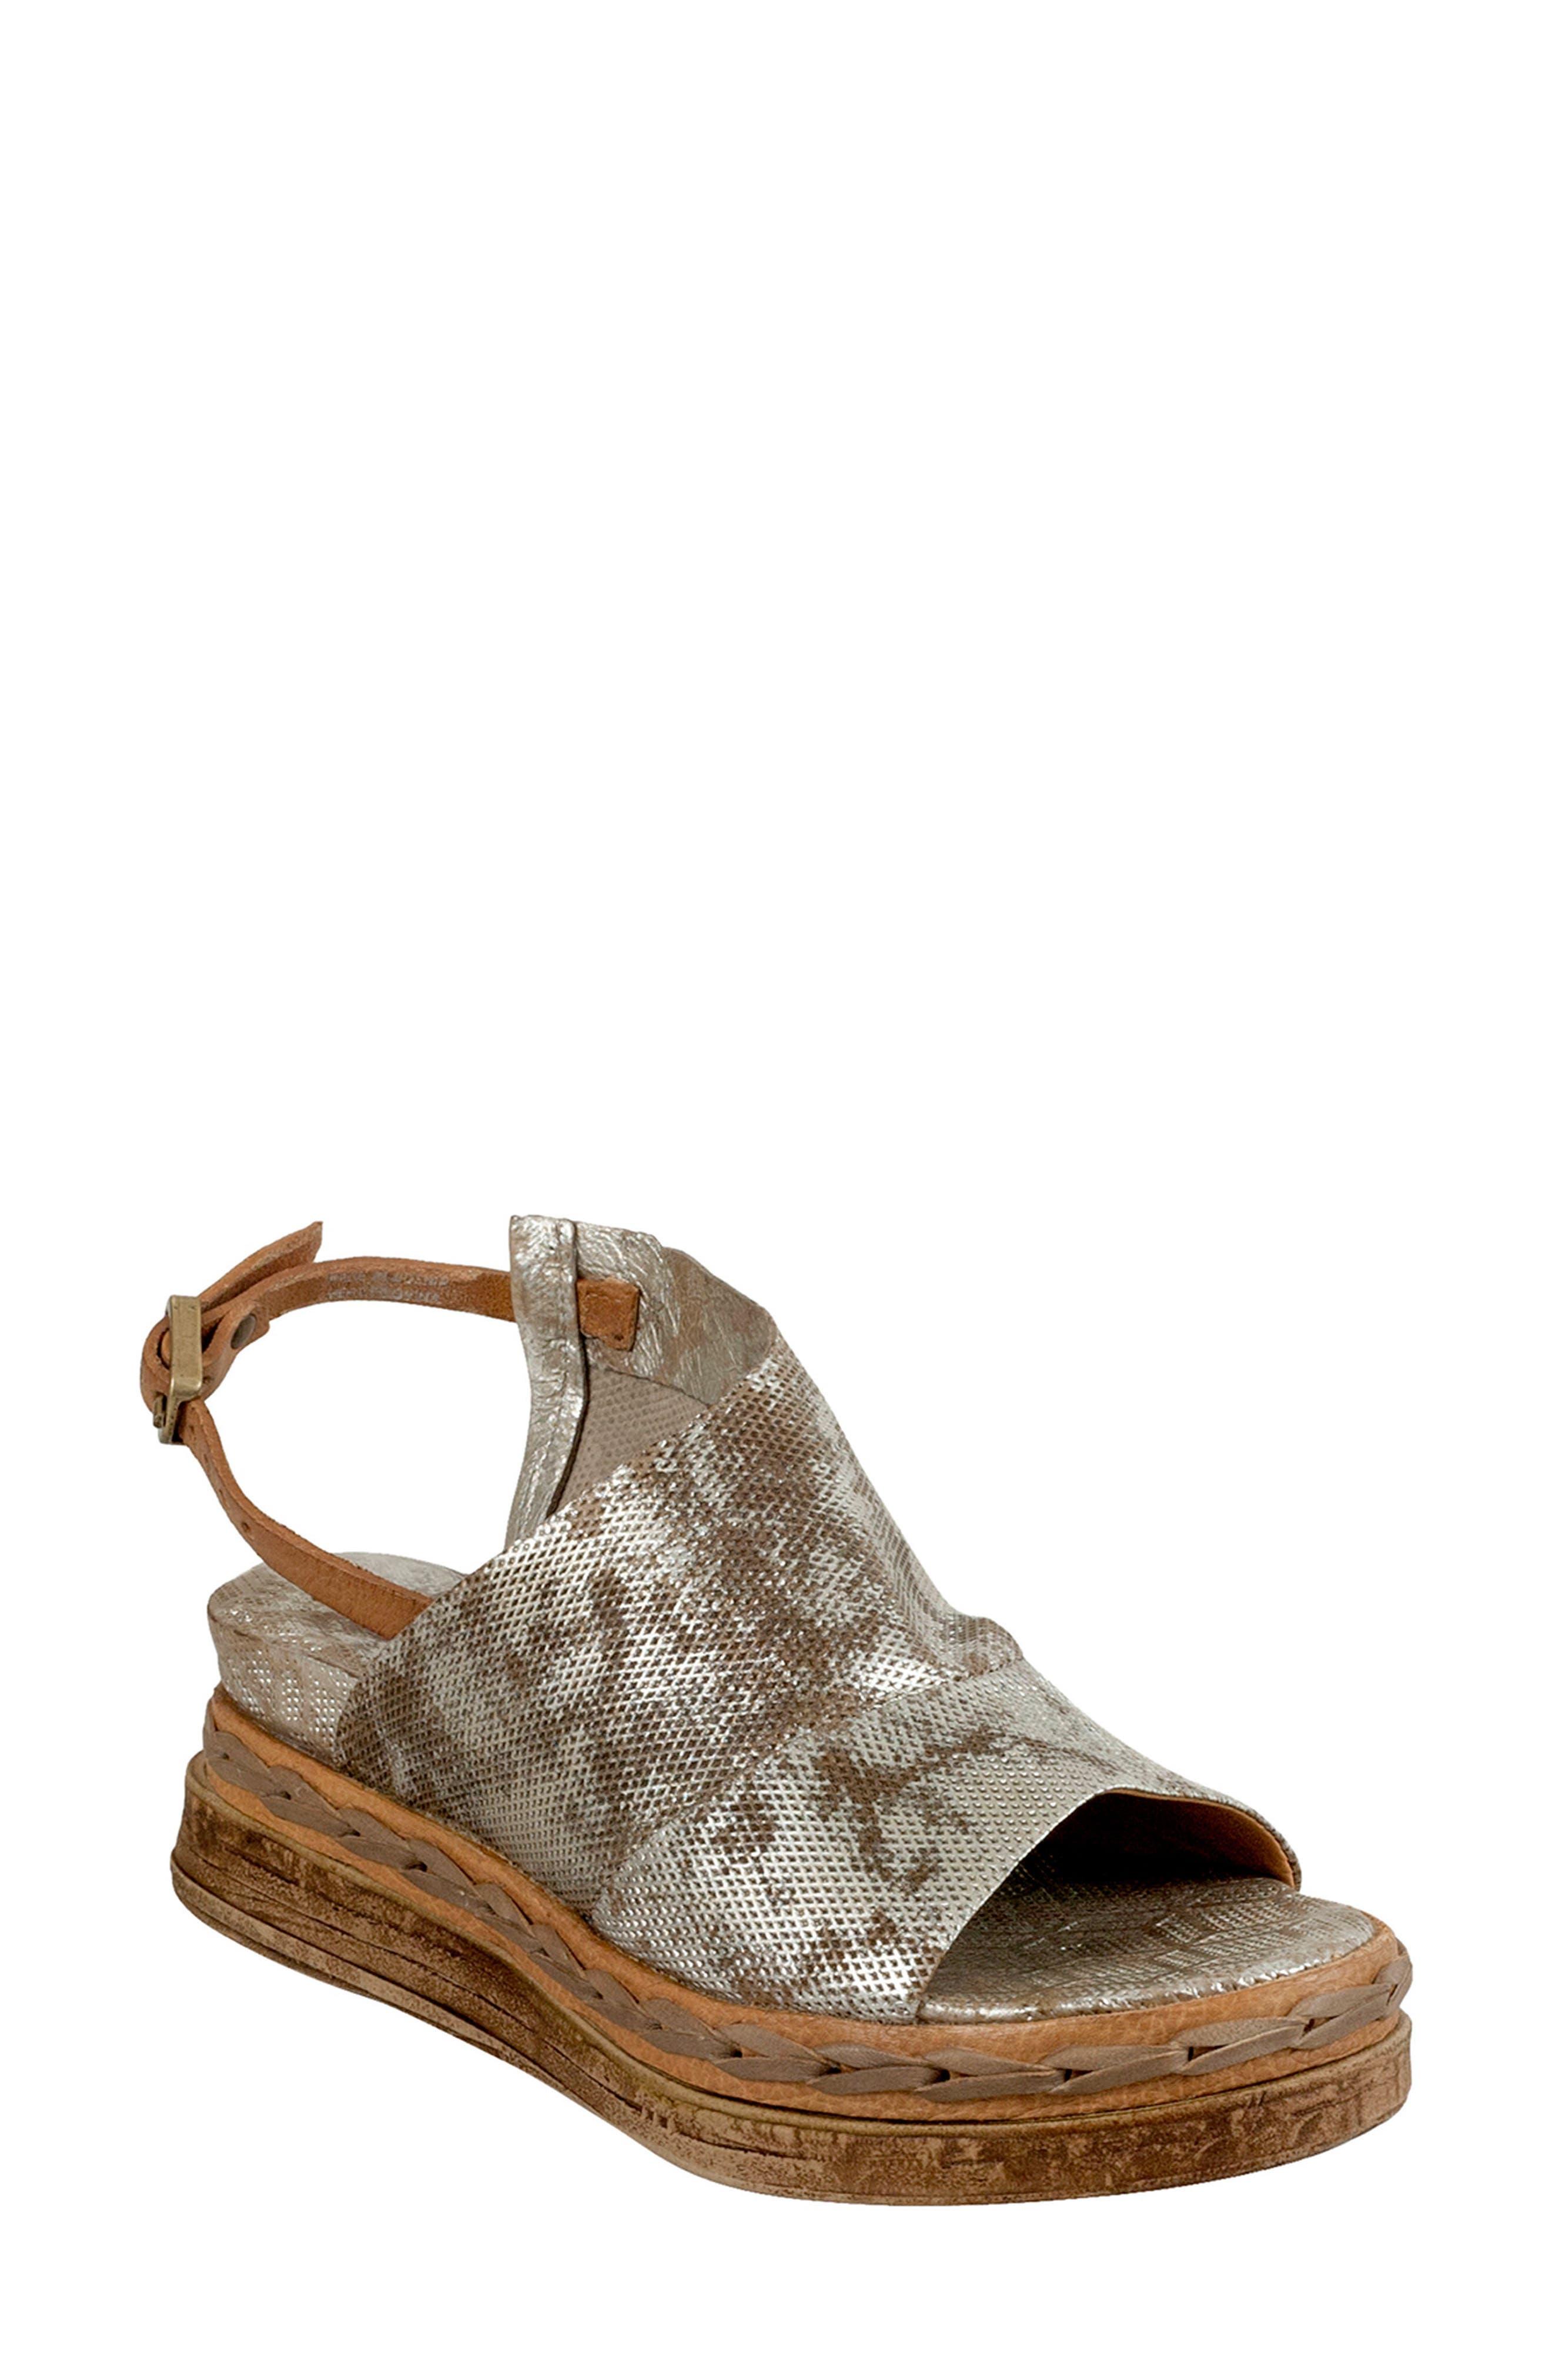 Lira Platform Sandal,                         Main,                         color, 042